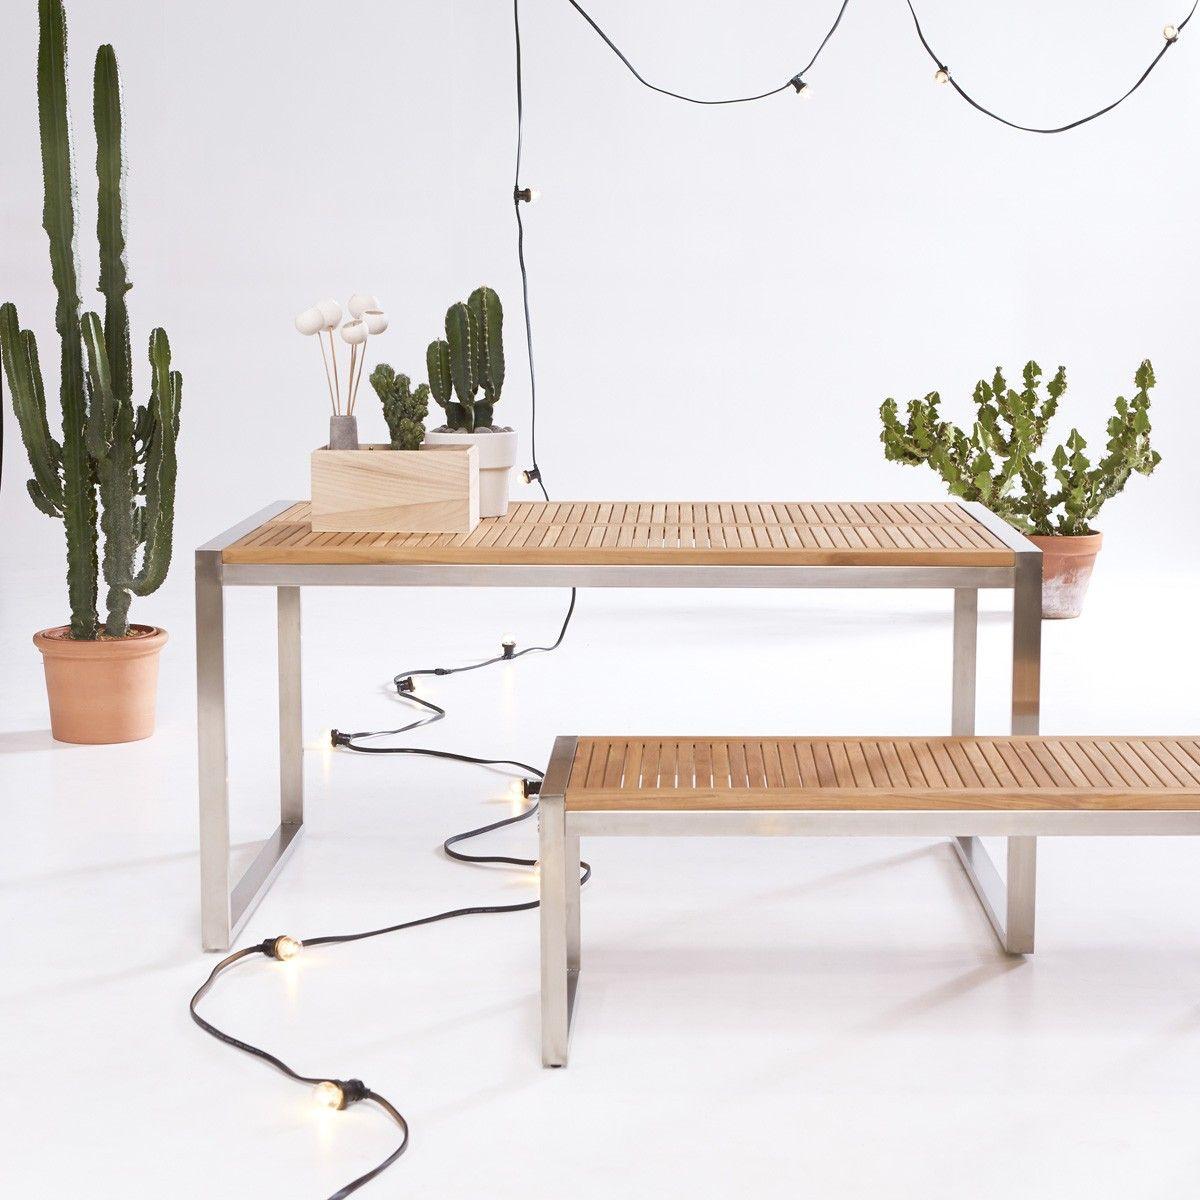 Salon De Jardin Teca Y Acero Inoxidable Arno In 2020 Teak Outdoor Tikamoon Teak Outdoor Furniture